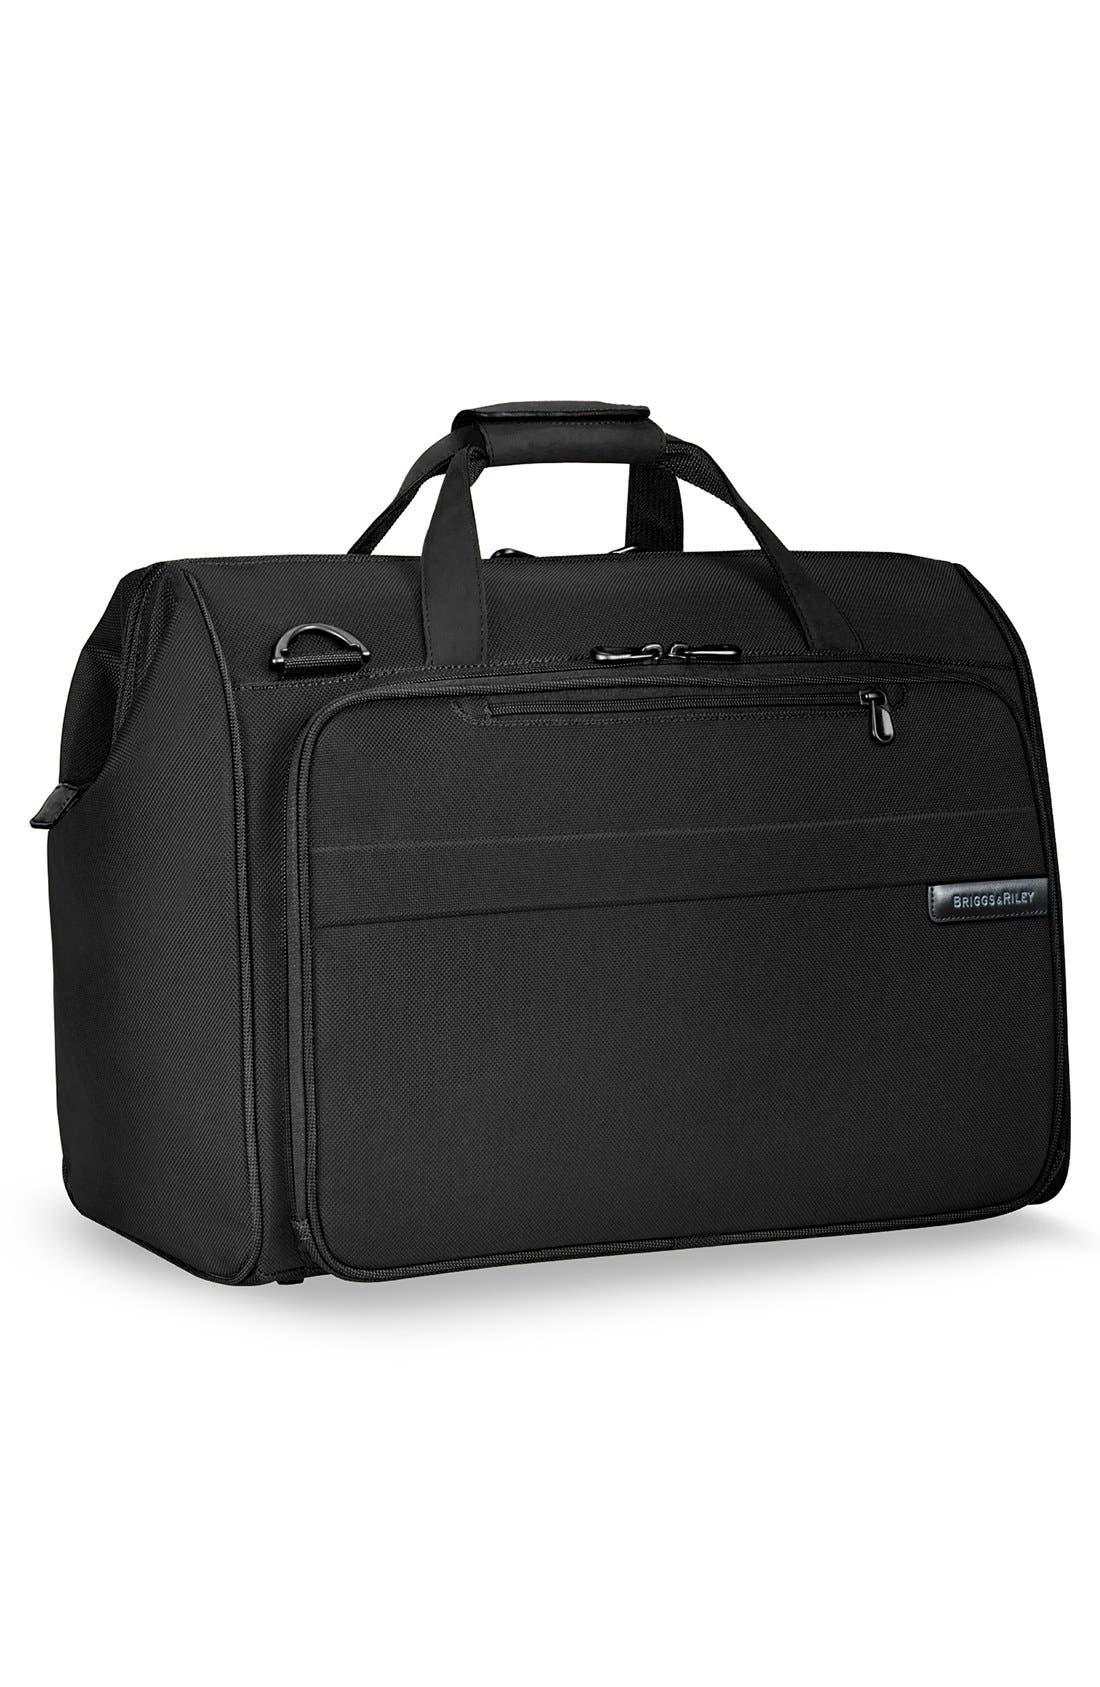 'Baseline' Duffel Bag,                             Alternate thumbnail 4, color,                             BLACK